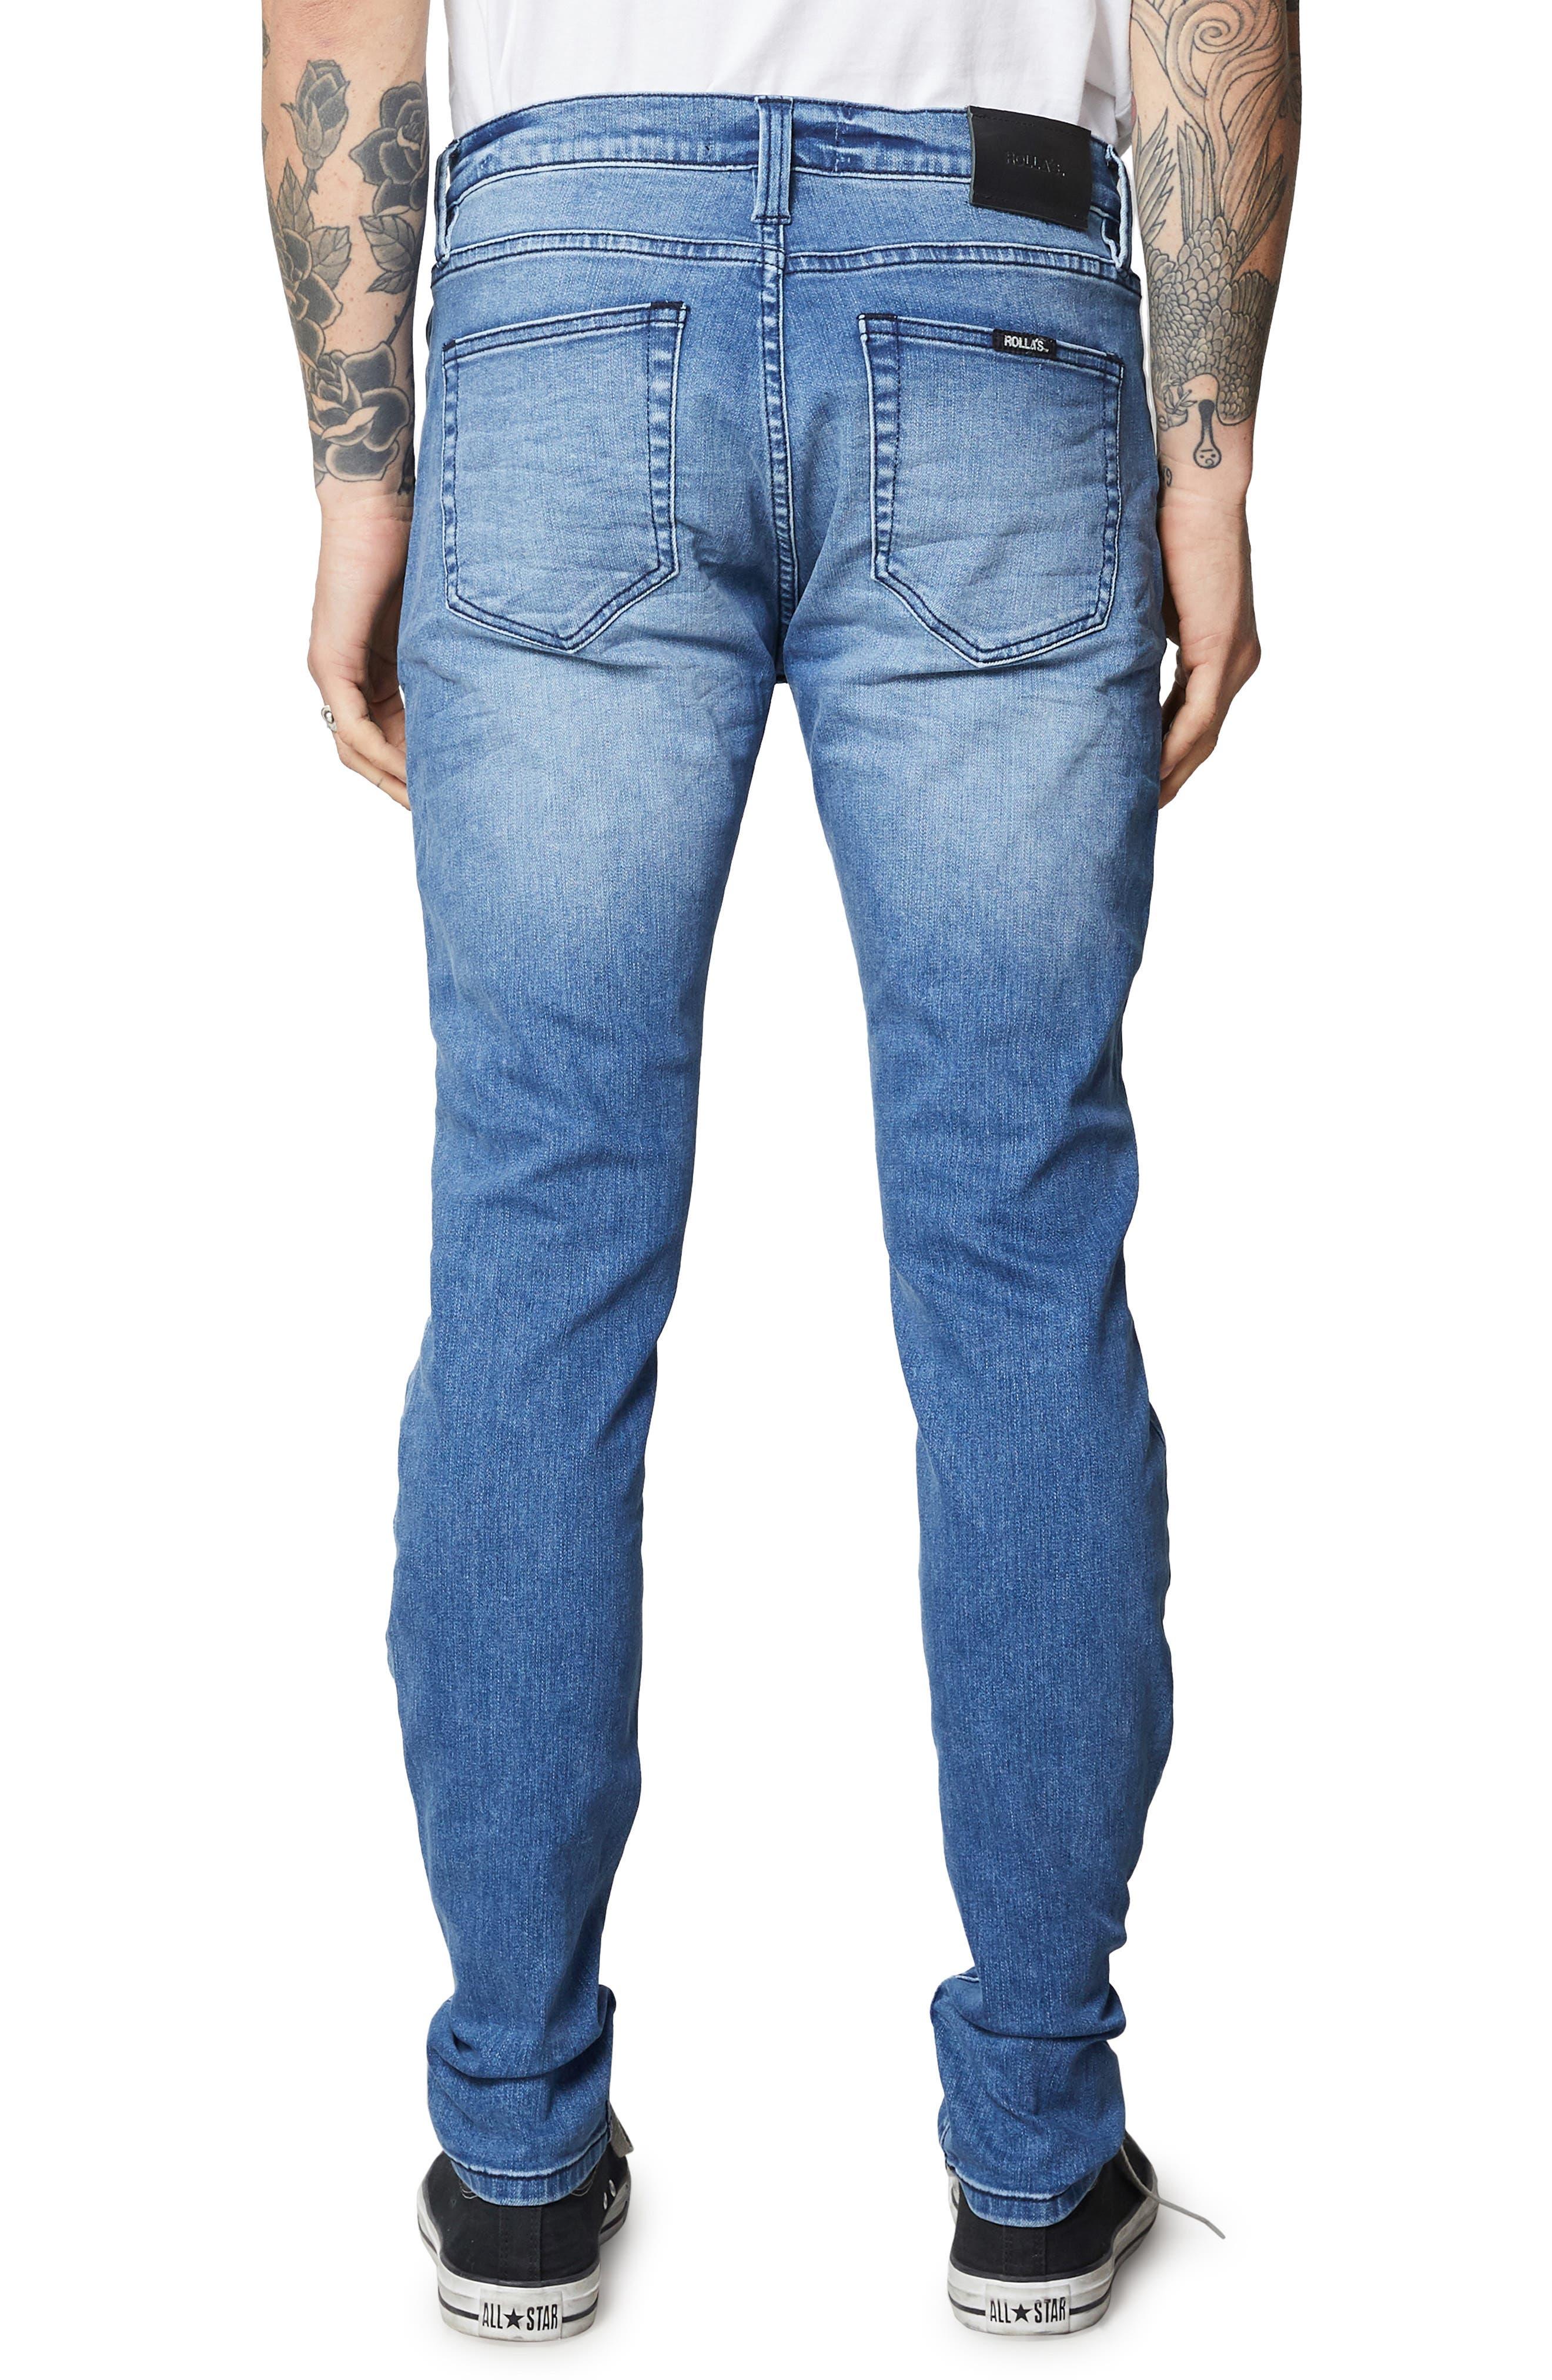 Stinger Skinny Fit Jeans,                             Alternate thumbnail 2, color,                             TRUE BLUE